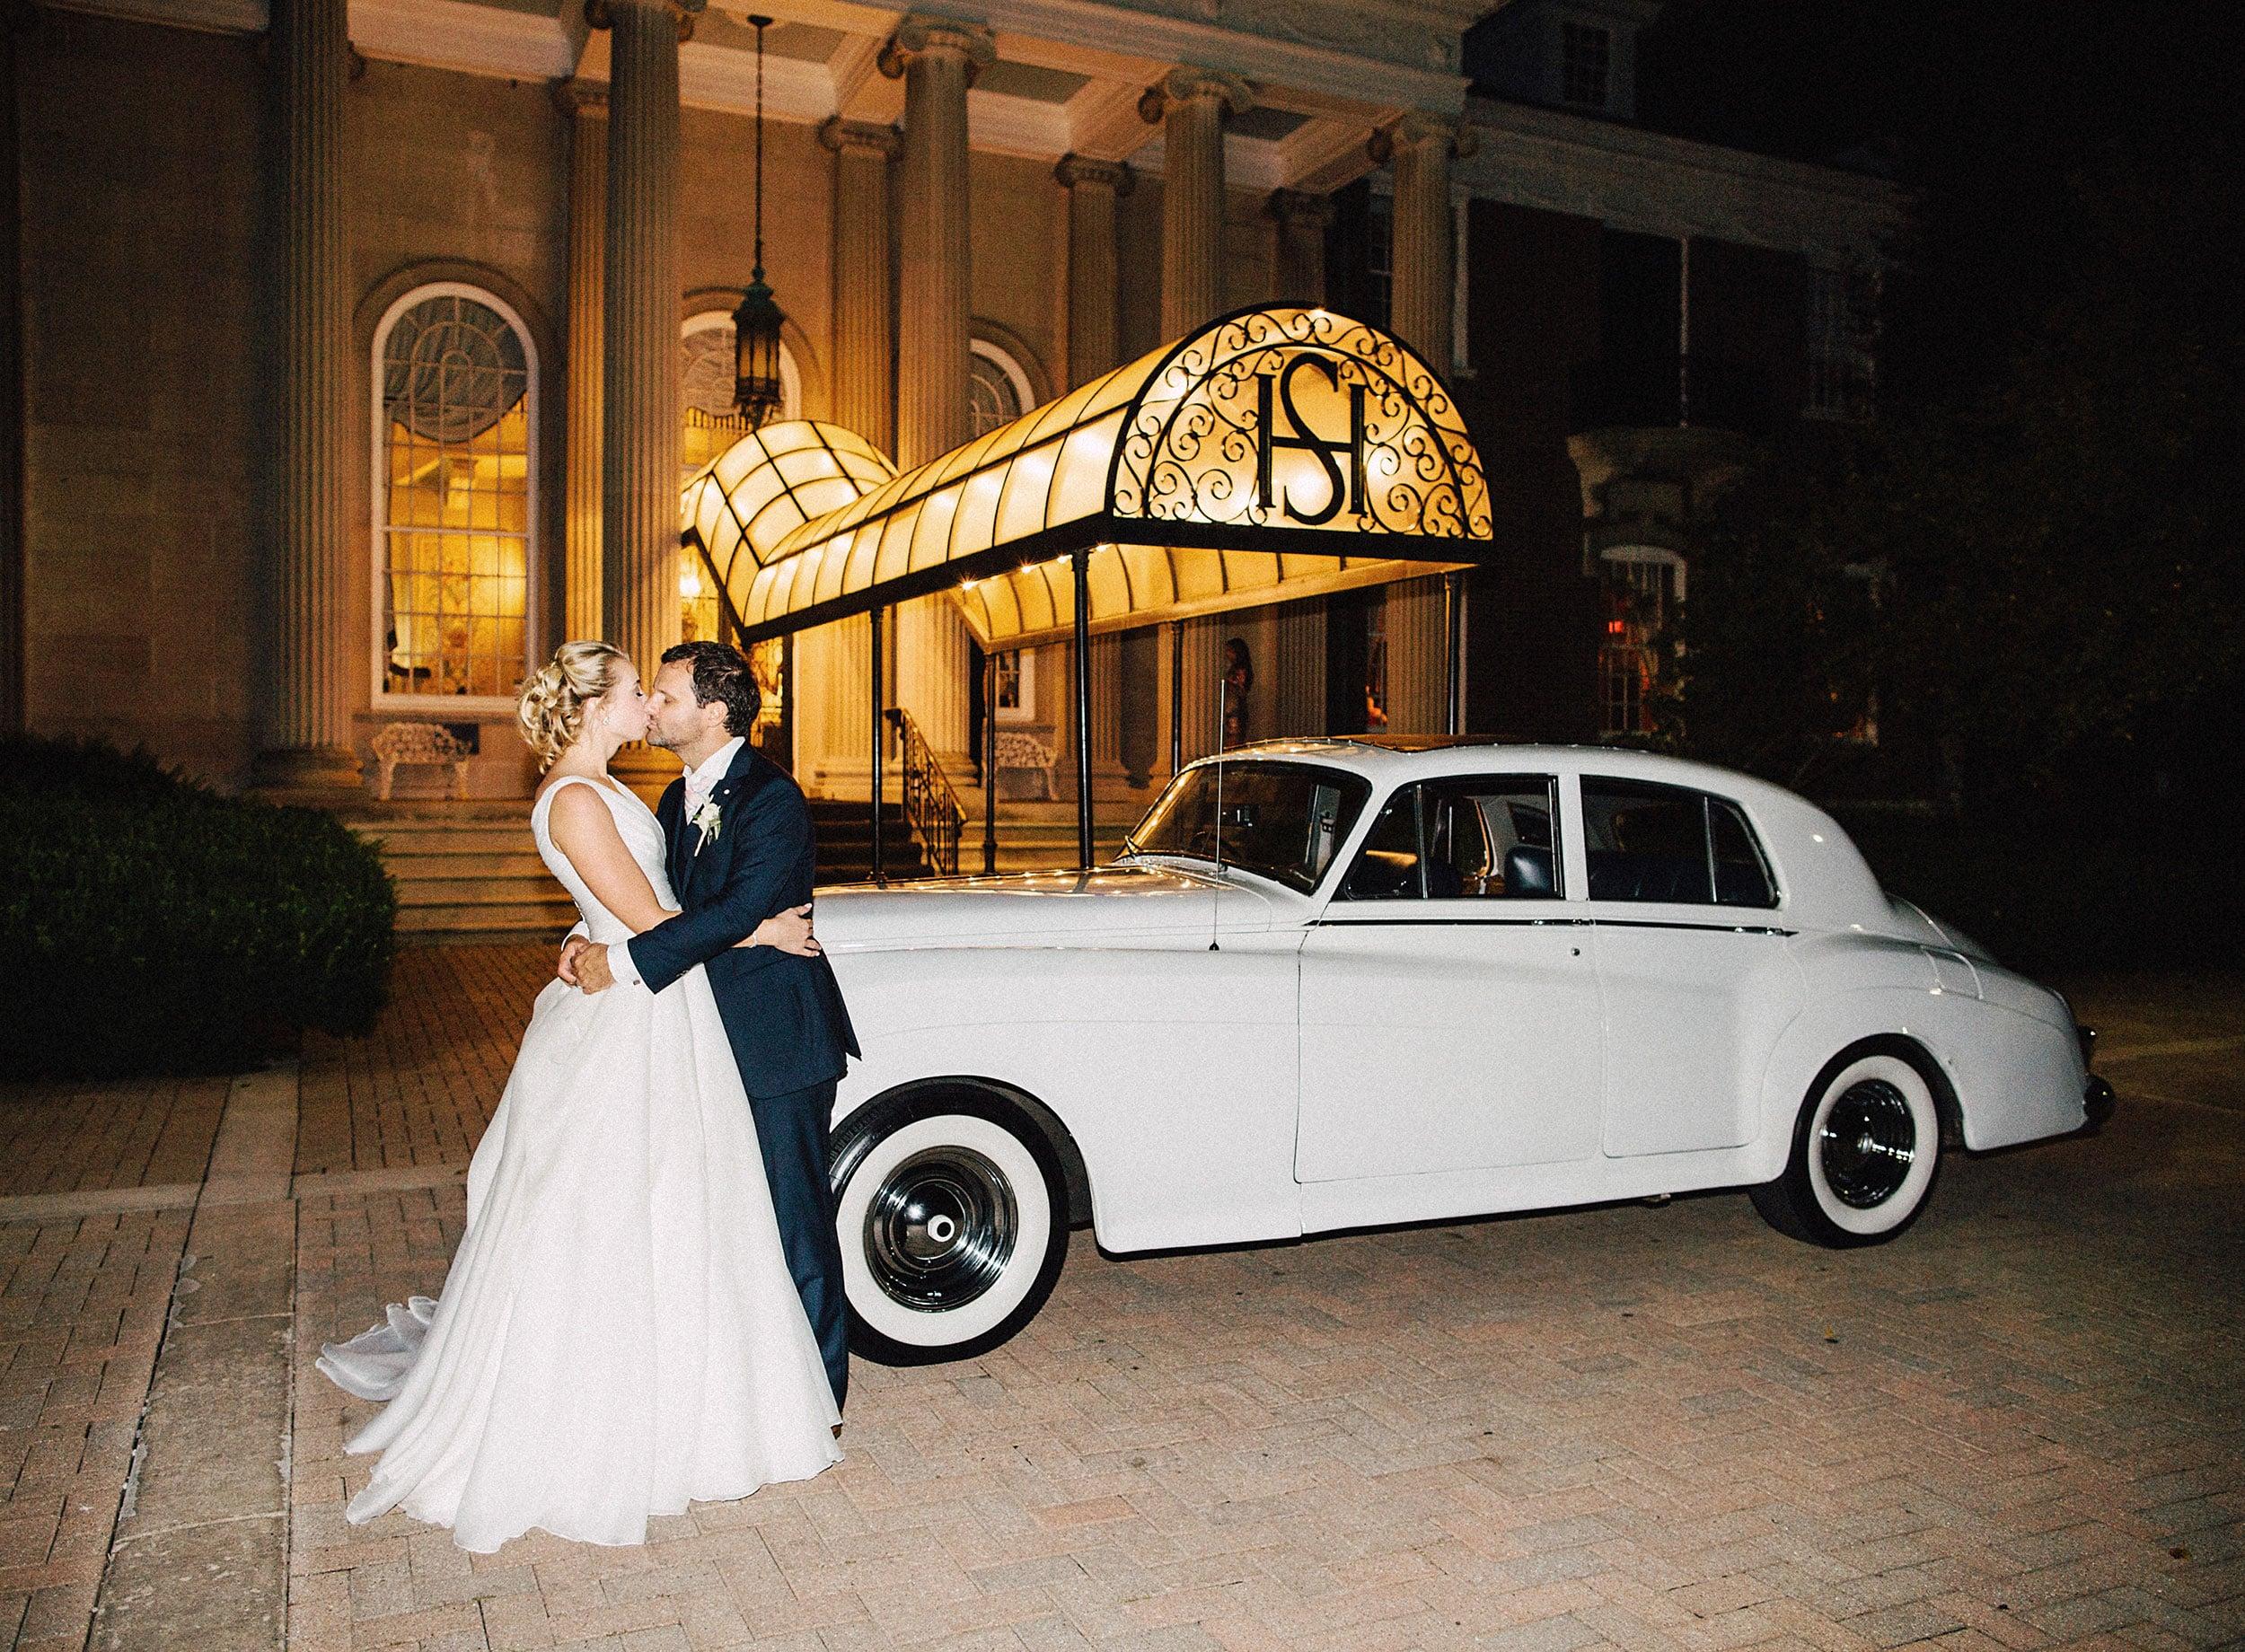 spindletop-lexington-wedding-photographer-047.JPG